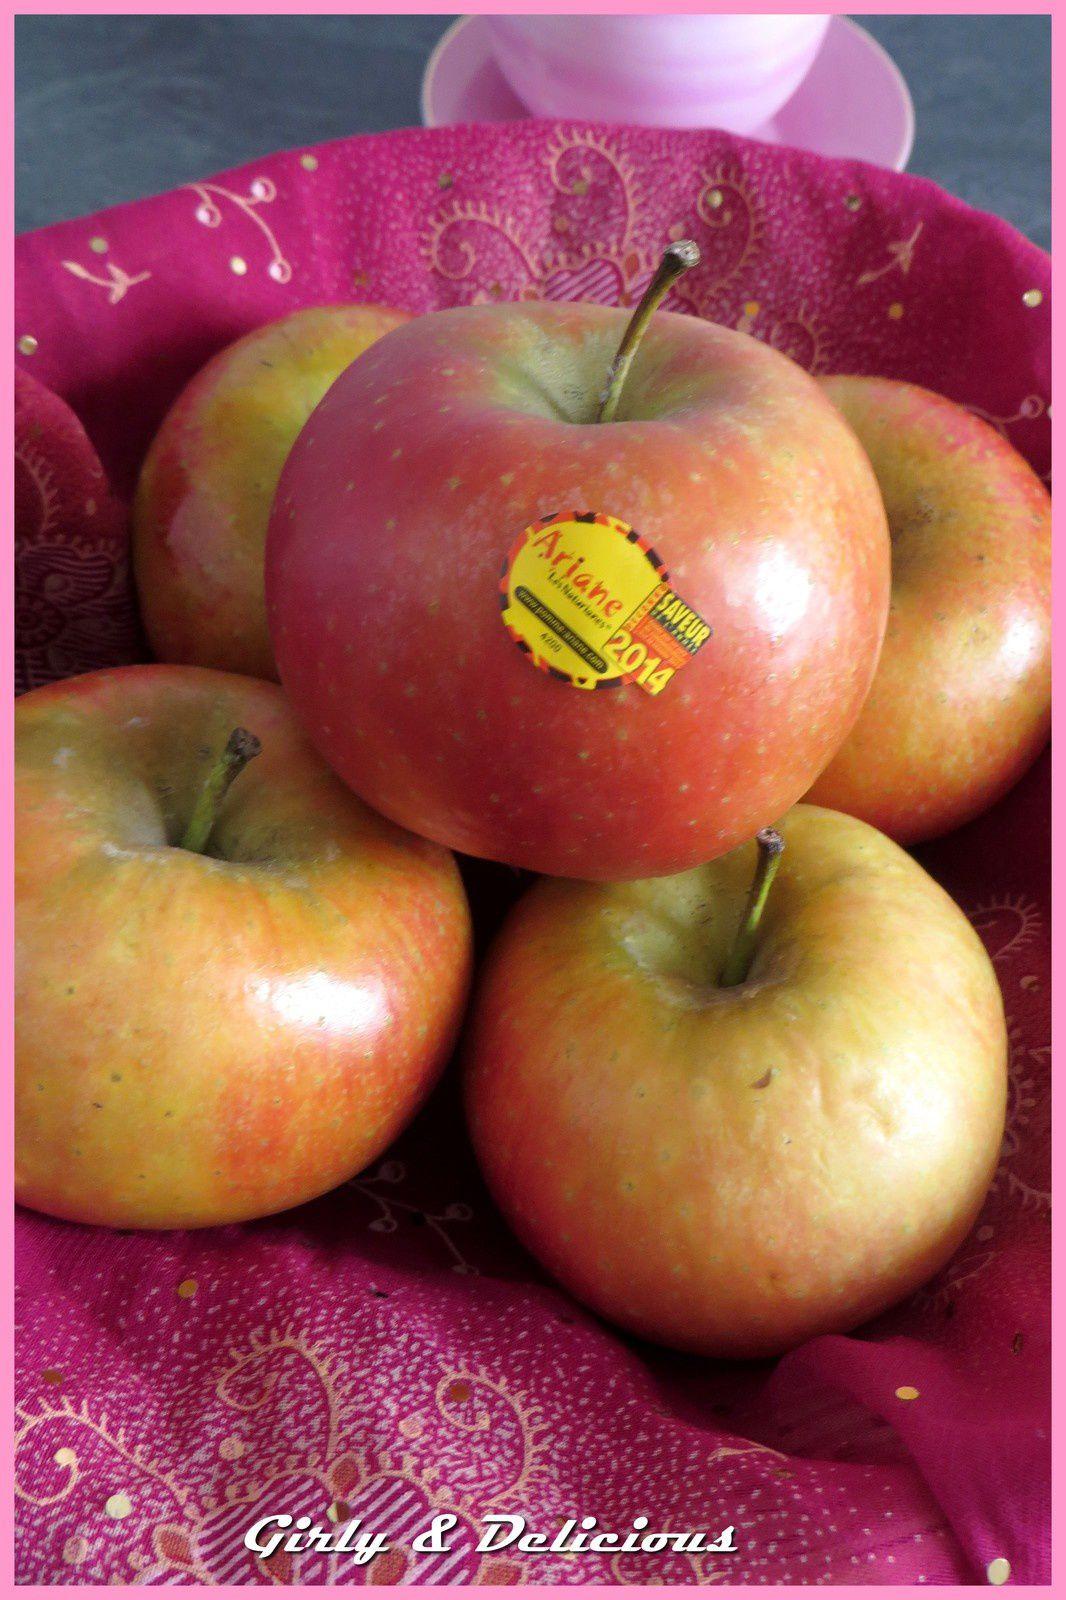 Tarte fine choco-pomme Ariane (concours la pomme Ariane Les Naturianes)